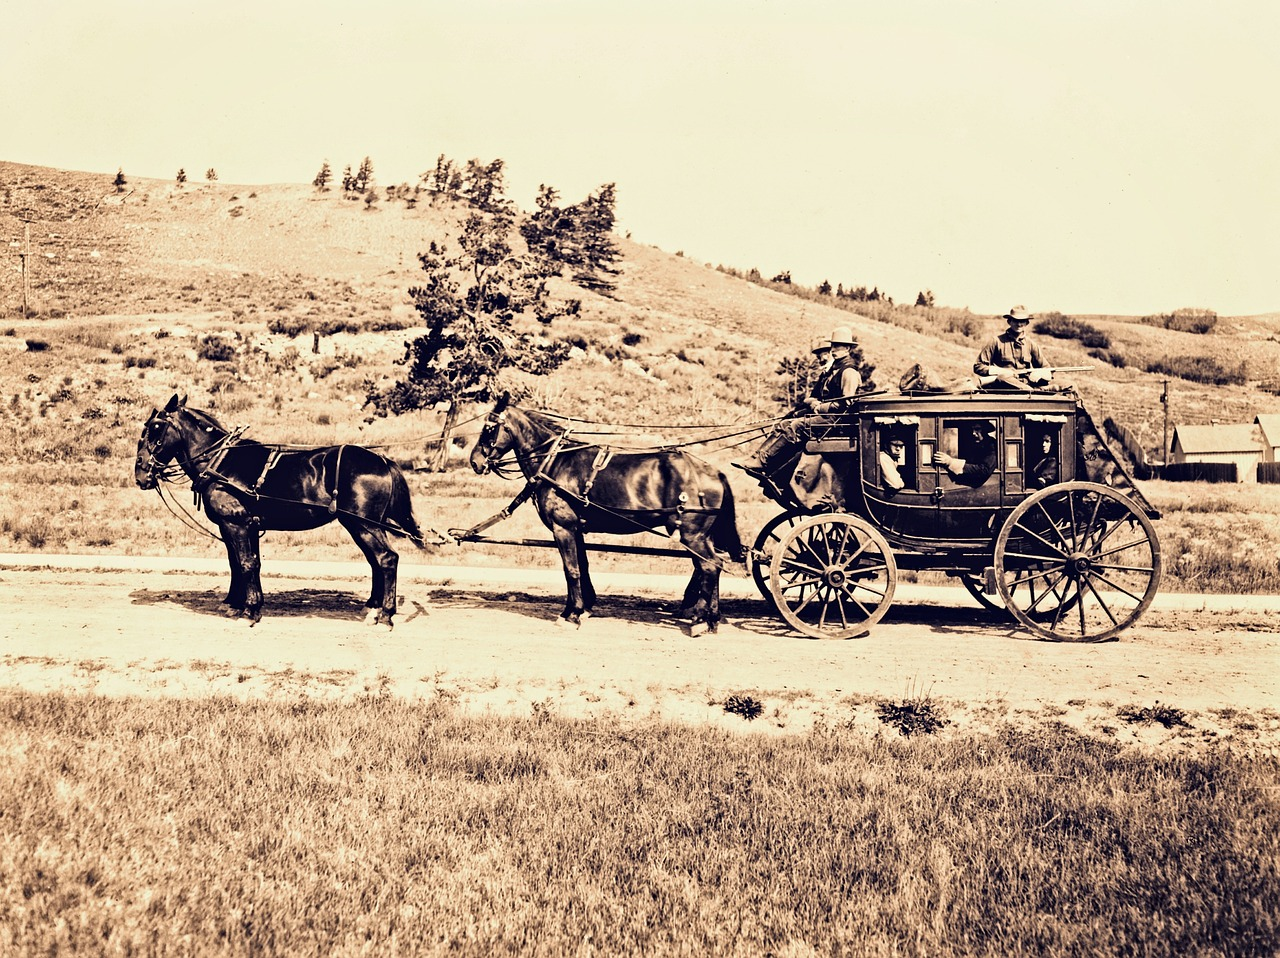 stagecoach-502130_1280